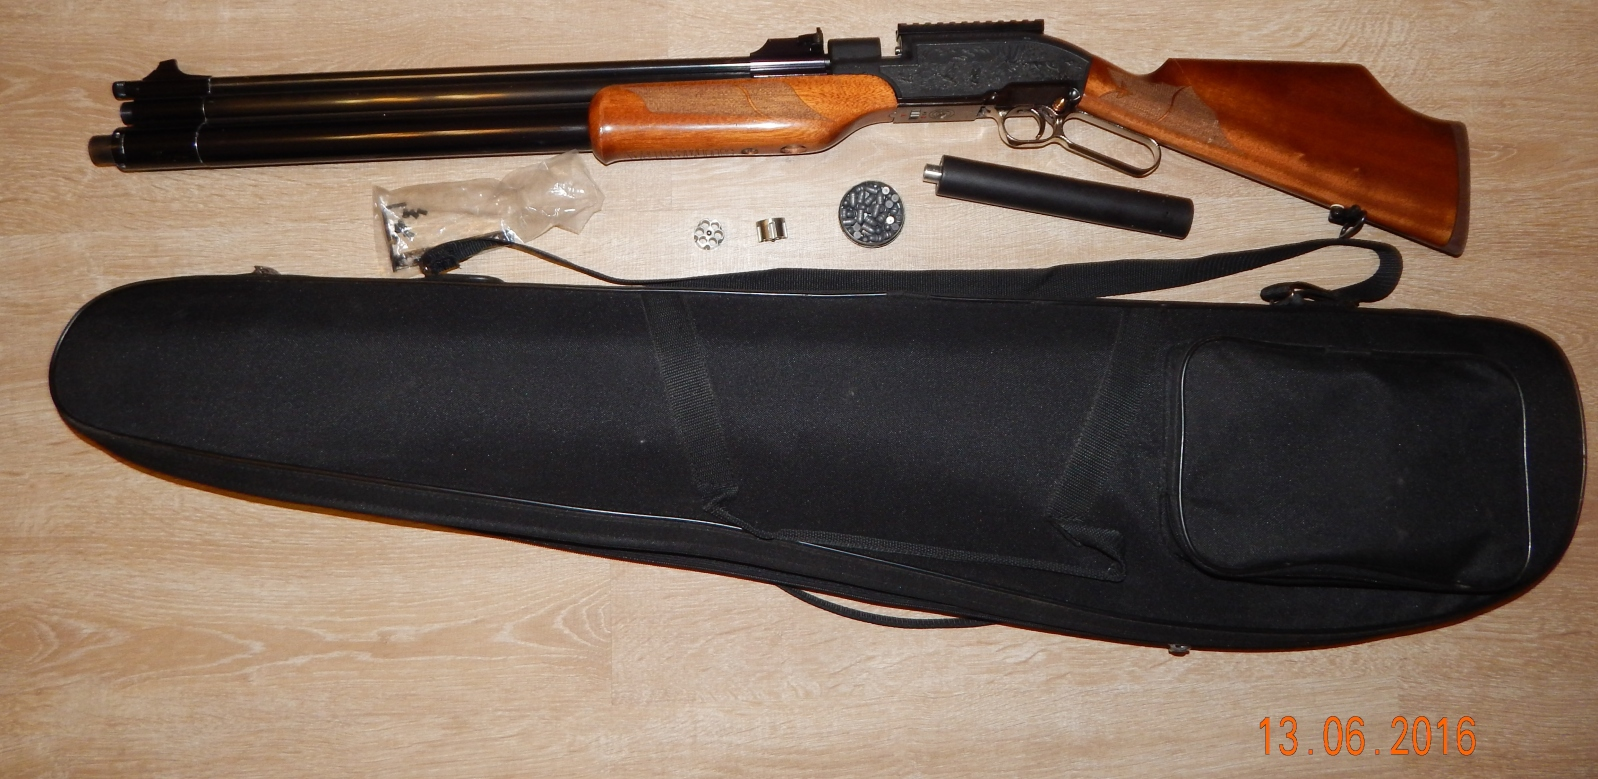 Продам Sumatra винтовка cal 6.35 объем 500 Mhg8jr